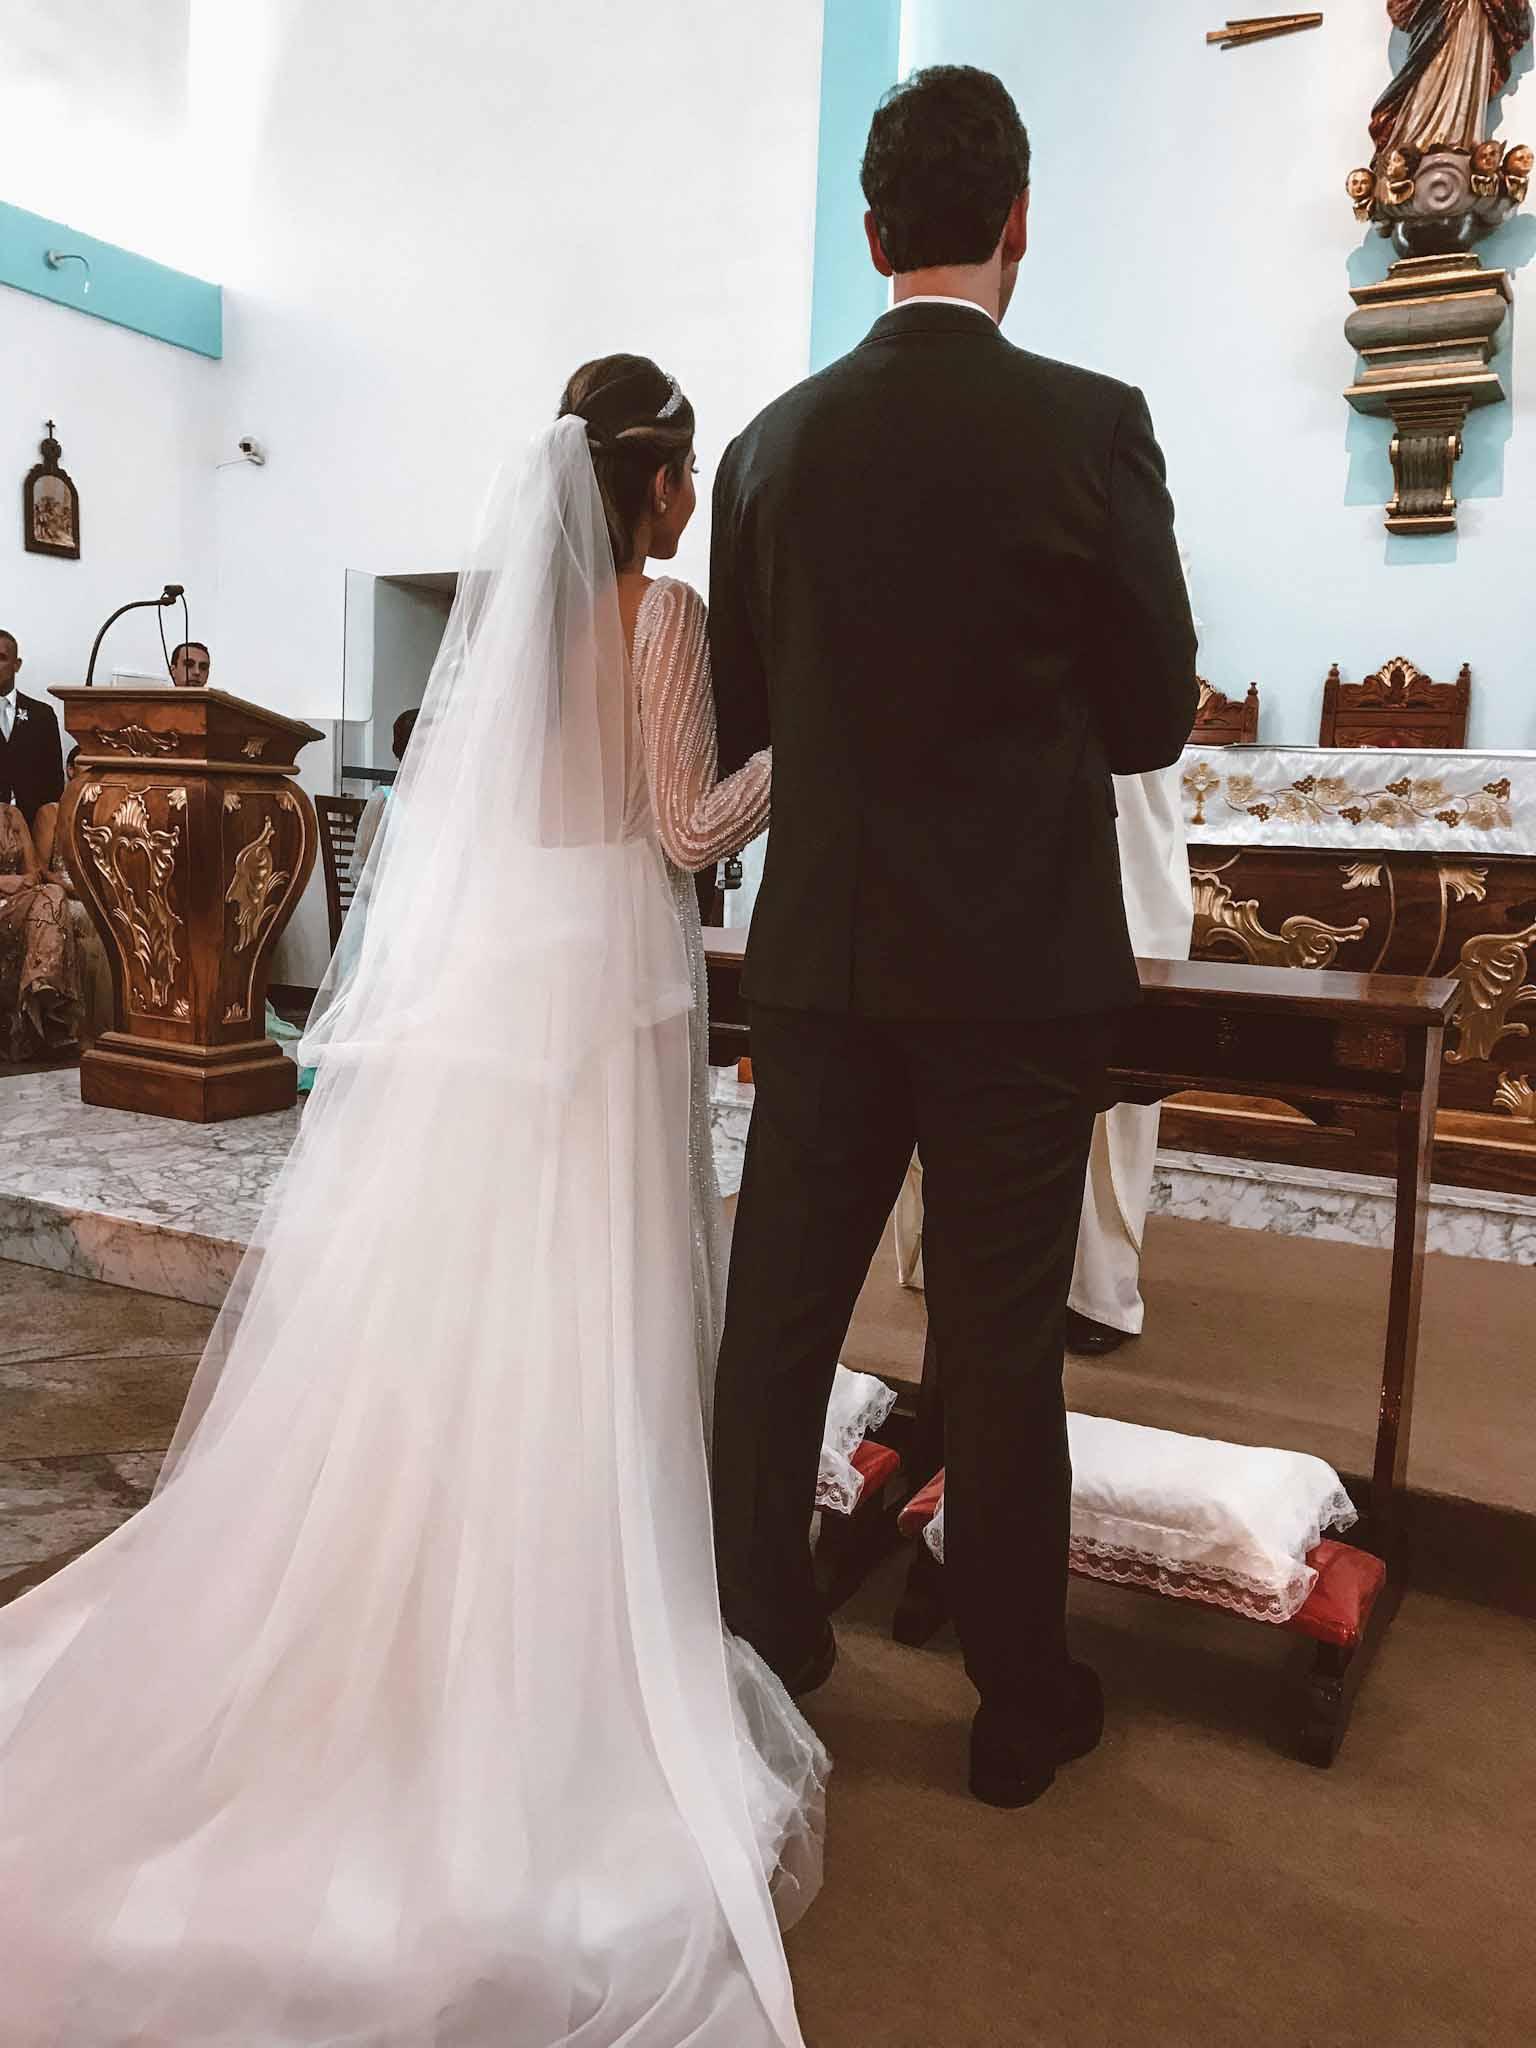 casamento-igreja-gavea.jpg